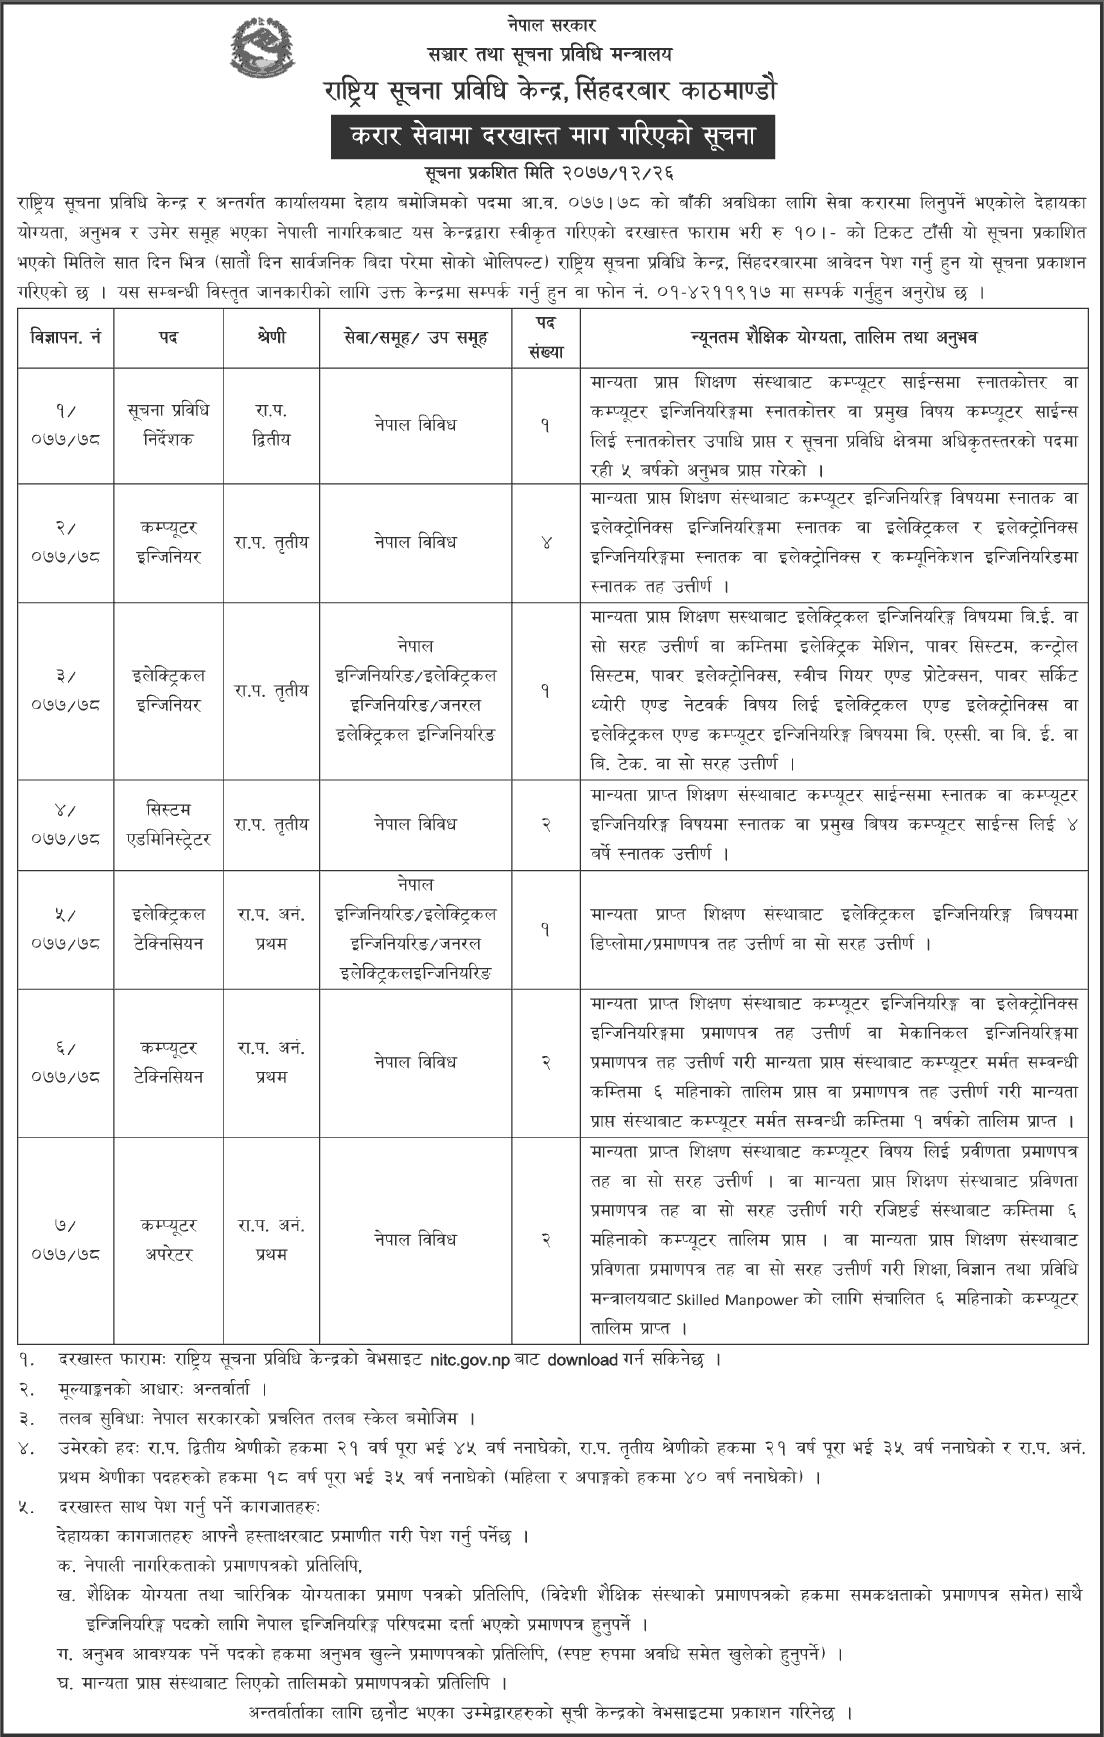 Nepal Government Jobs